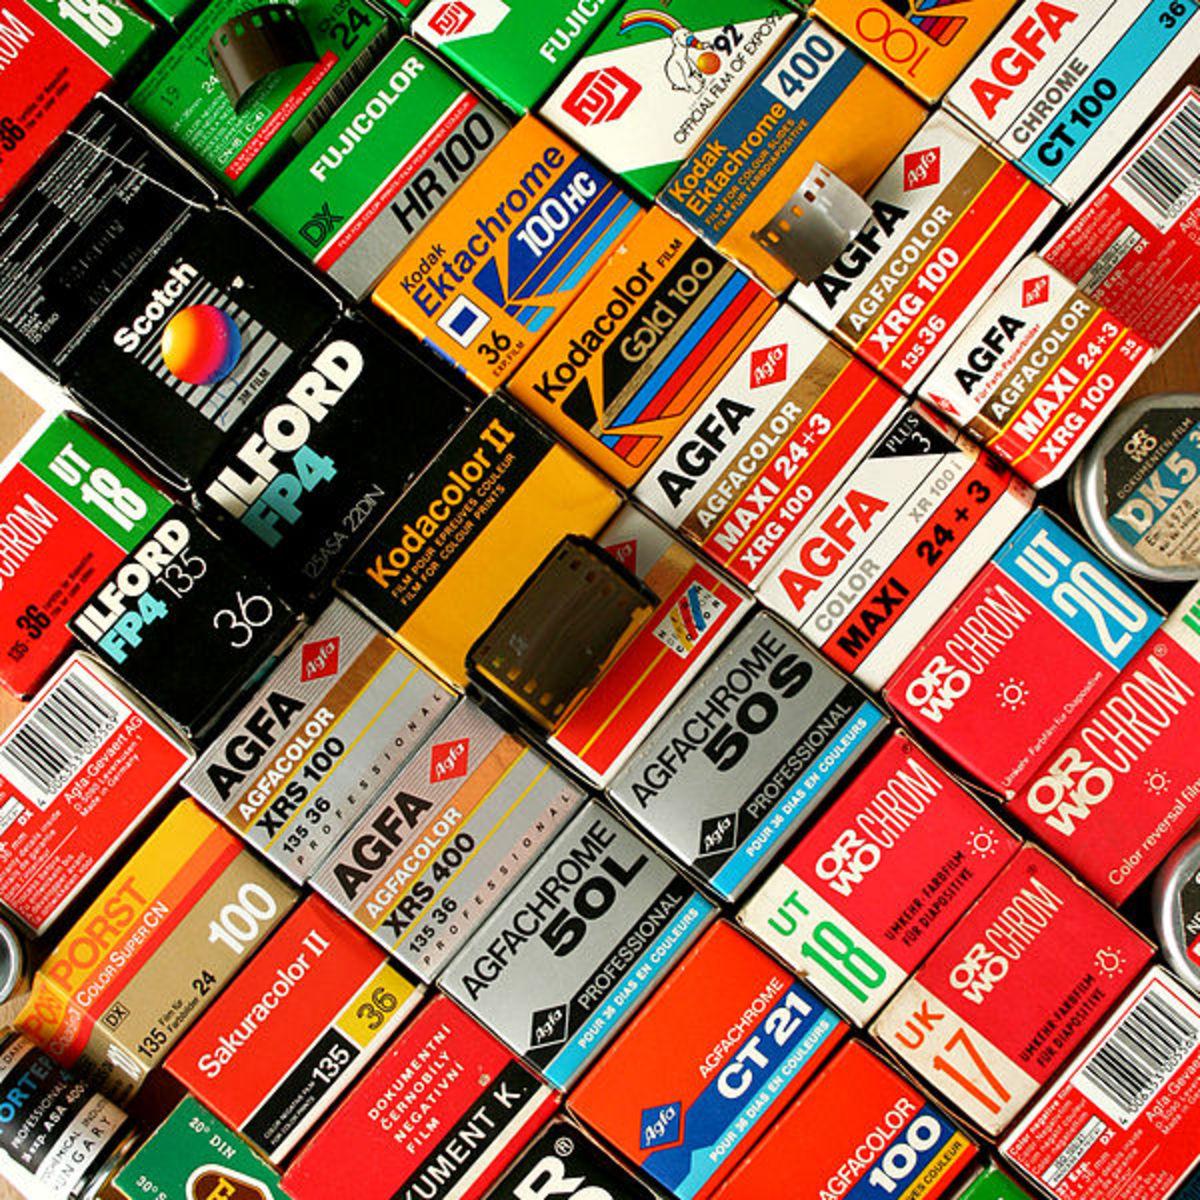 Review of Kodak , Afga and Fujichrome Color Films